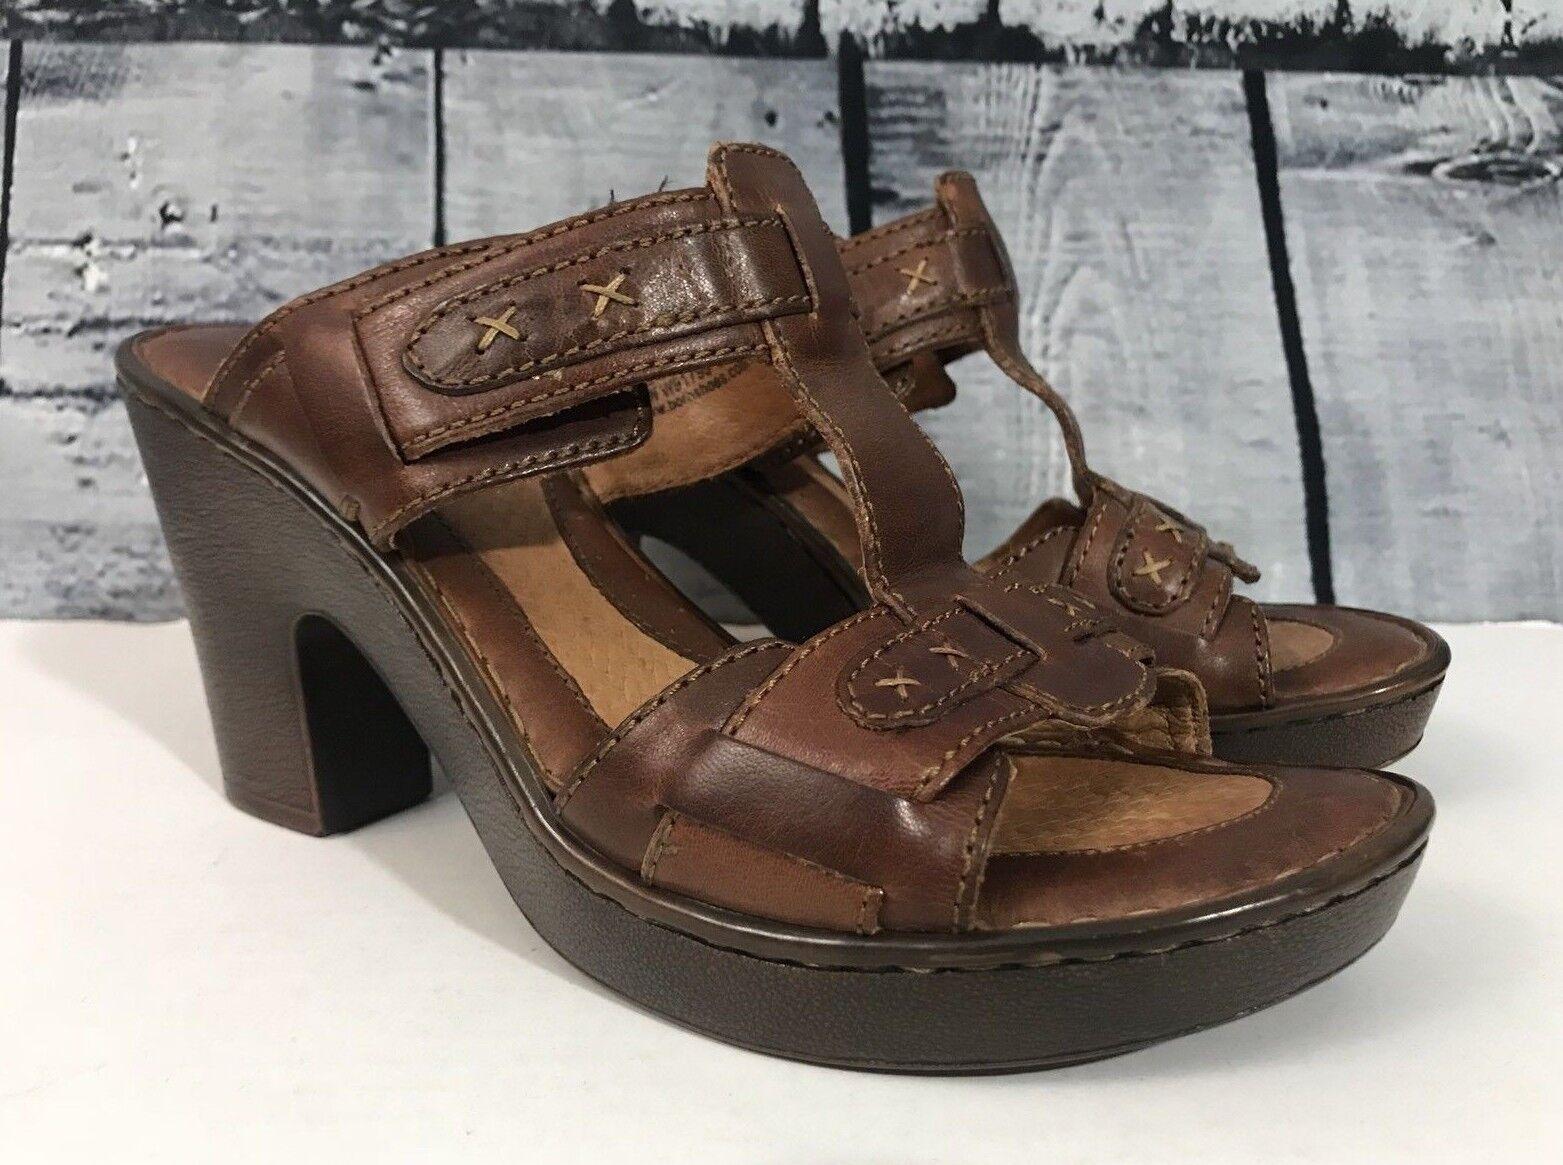 Born Beam Carmel Carmel Carmel shoes 8 Chunky Heel Slide Sandals Brown Leather T Strap NWOT bb6962